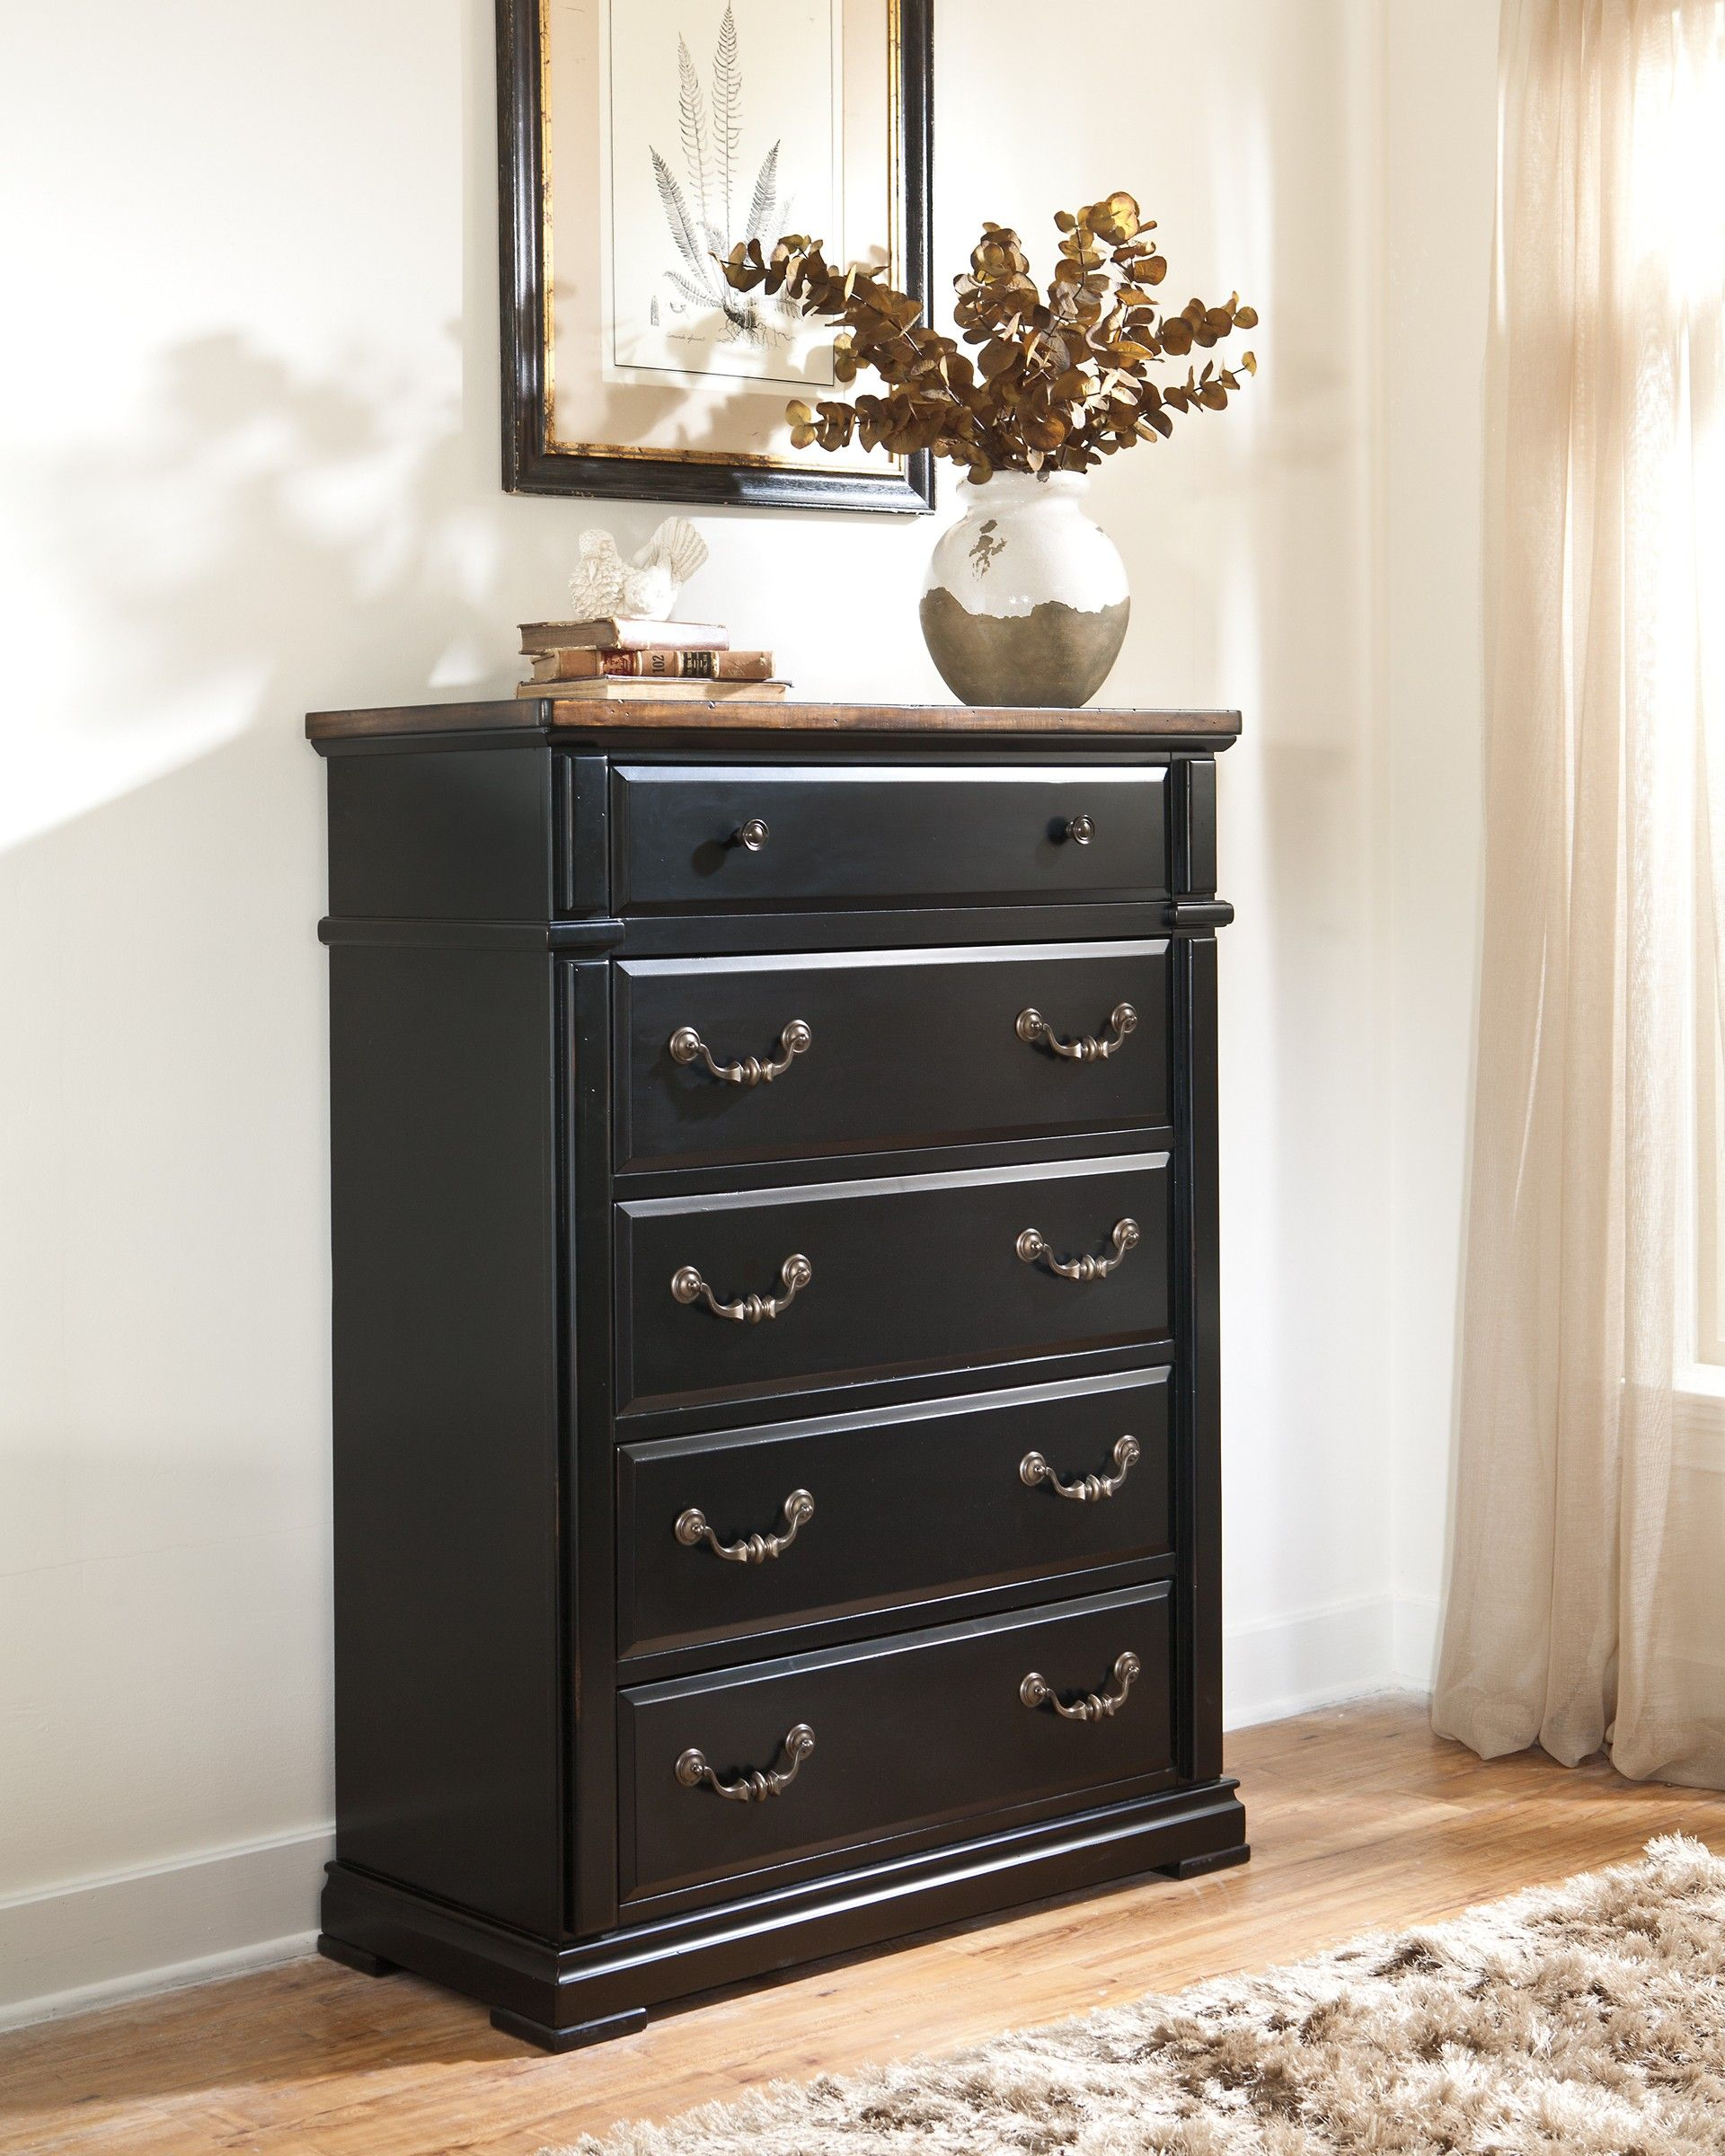 Ashley Breen B631 46 Signature Design Five Drawer Chest Chest Of Drawers Signature Design Dresser As Nightstand